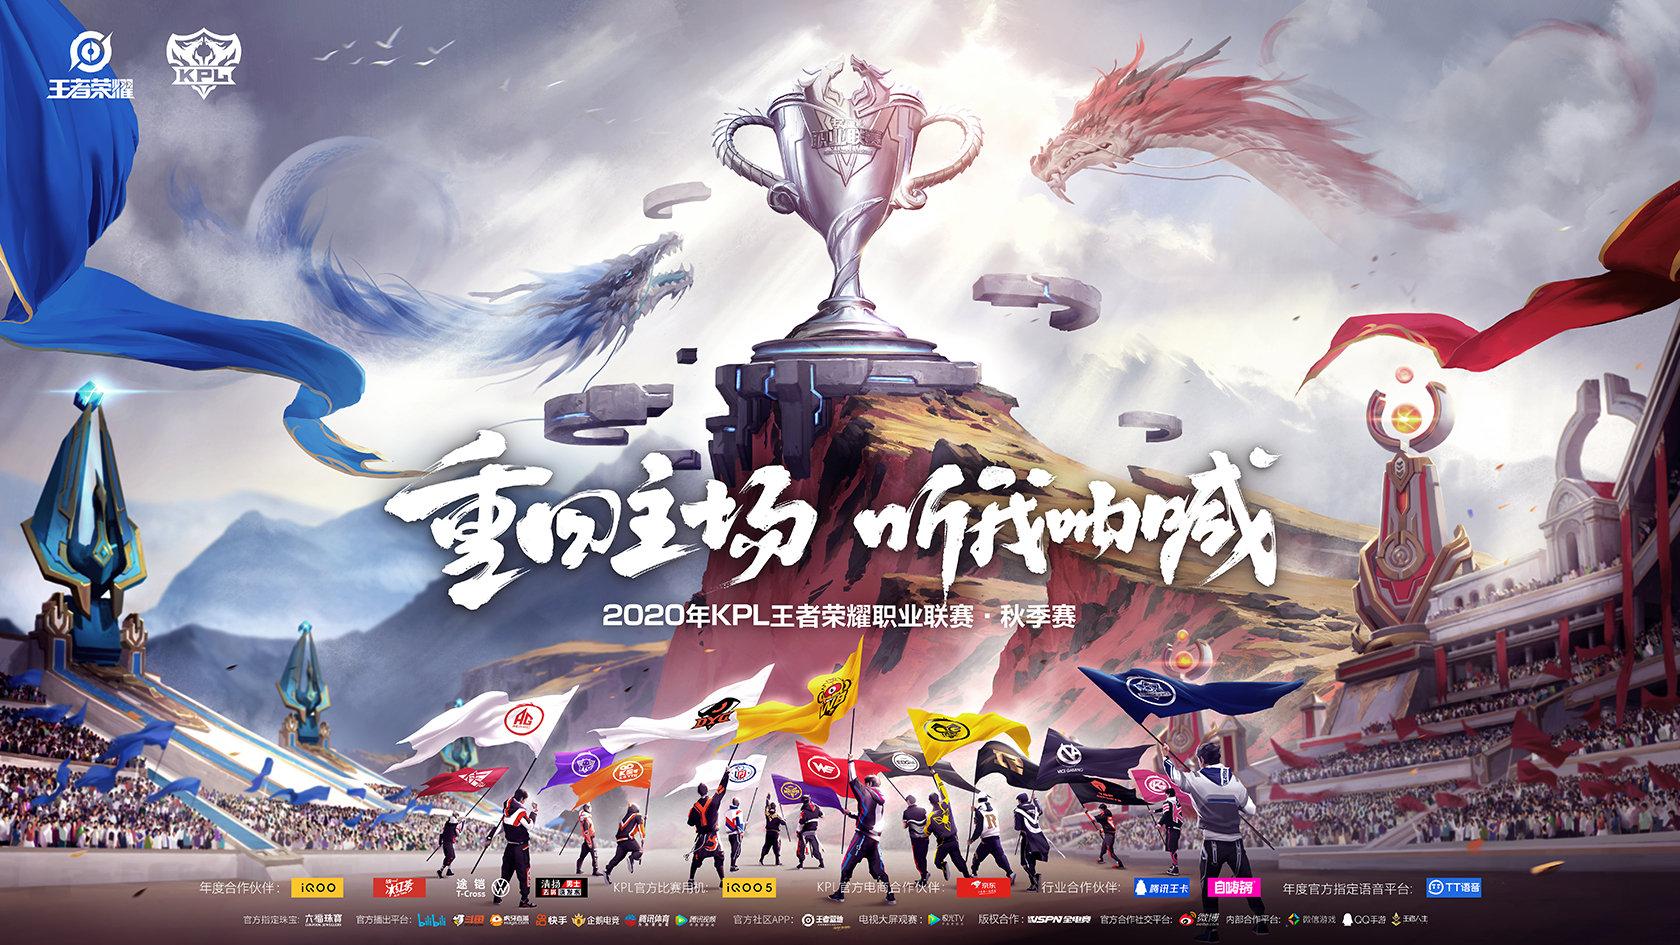 2020kpl秋季赛常规赛9月16日Hero久竞vsTTG第一场比赛视频回放